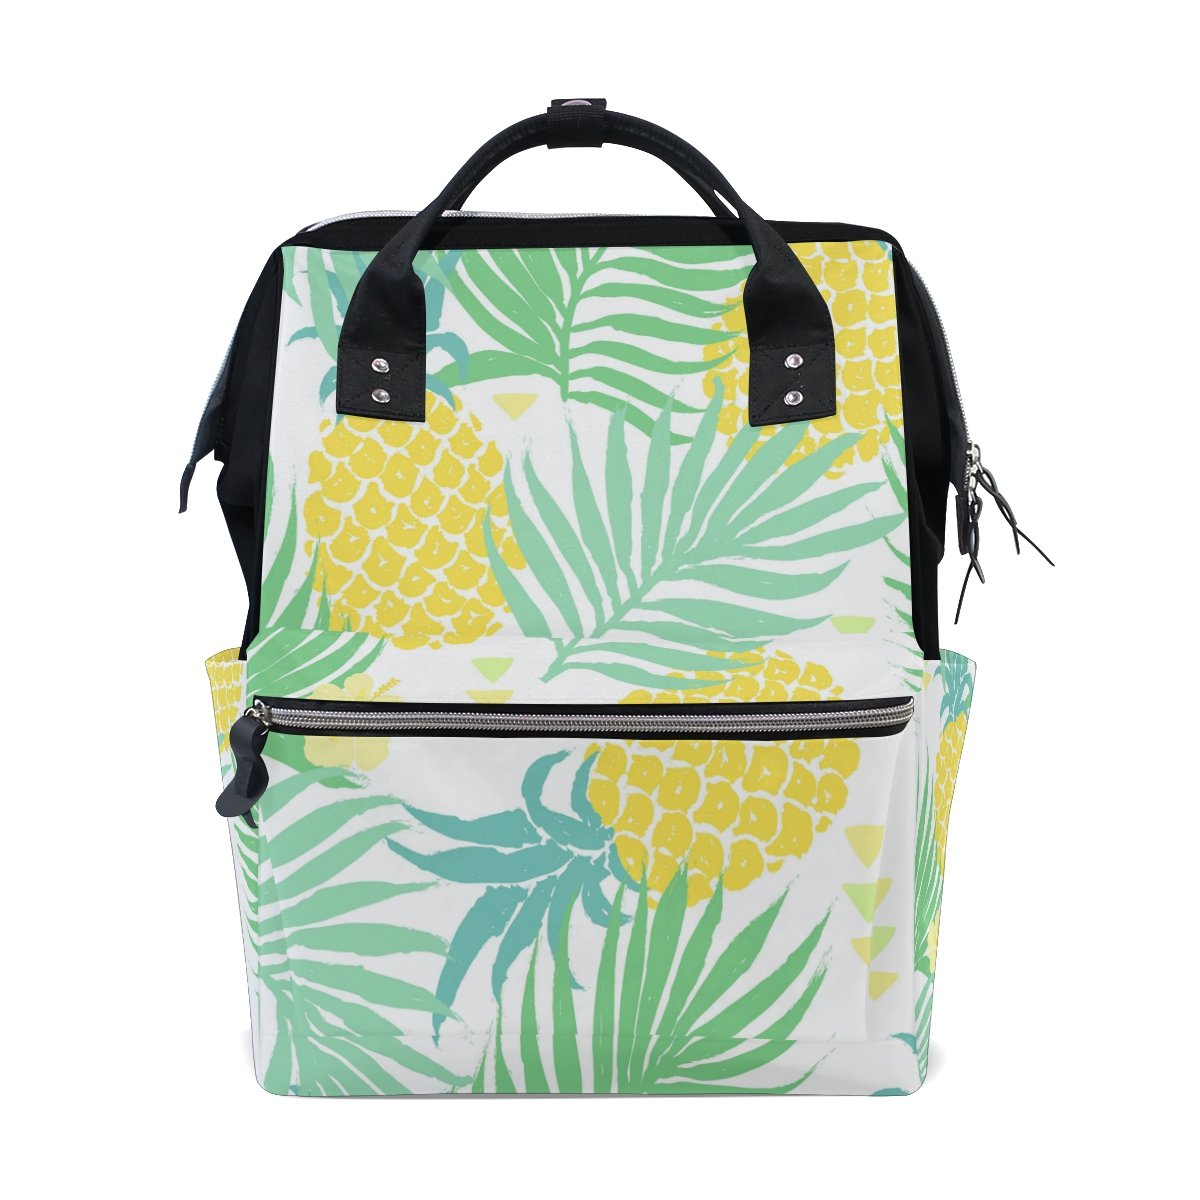 WOZO Tropical Palm Tree Pineapple Fruit Multi-function Diaper Bags Backpack Travel Bag